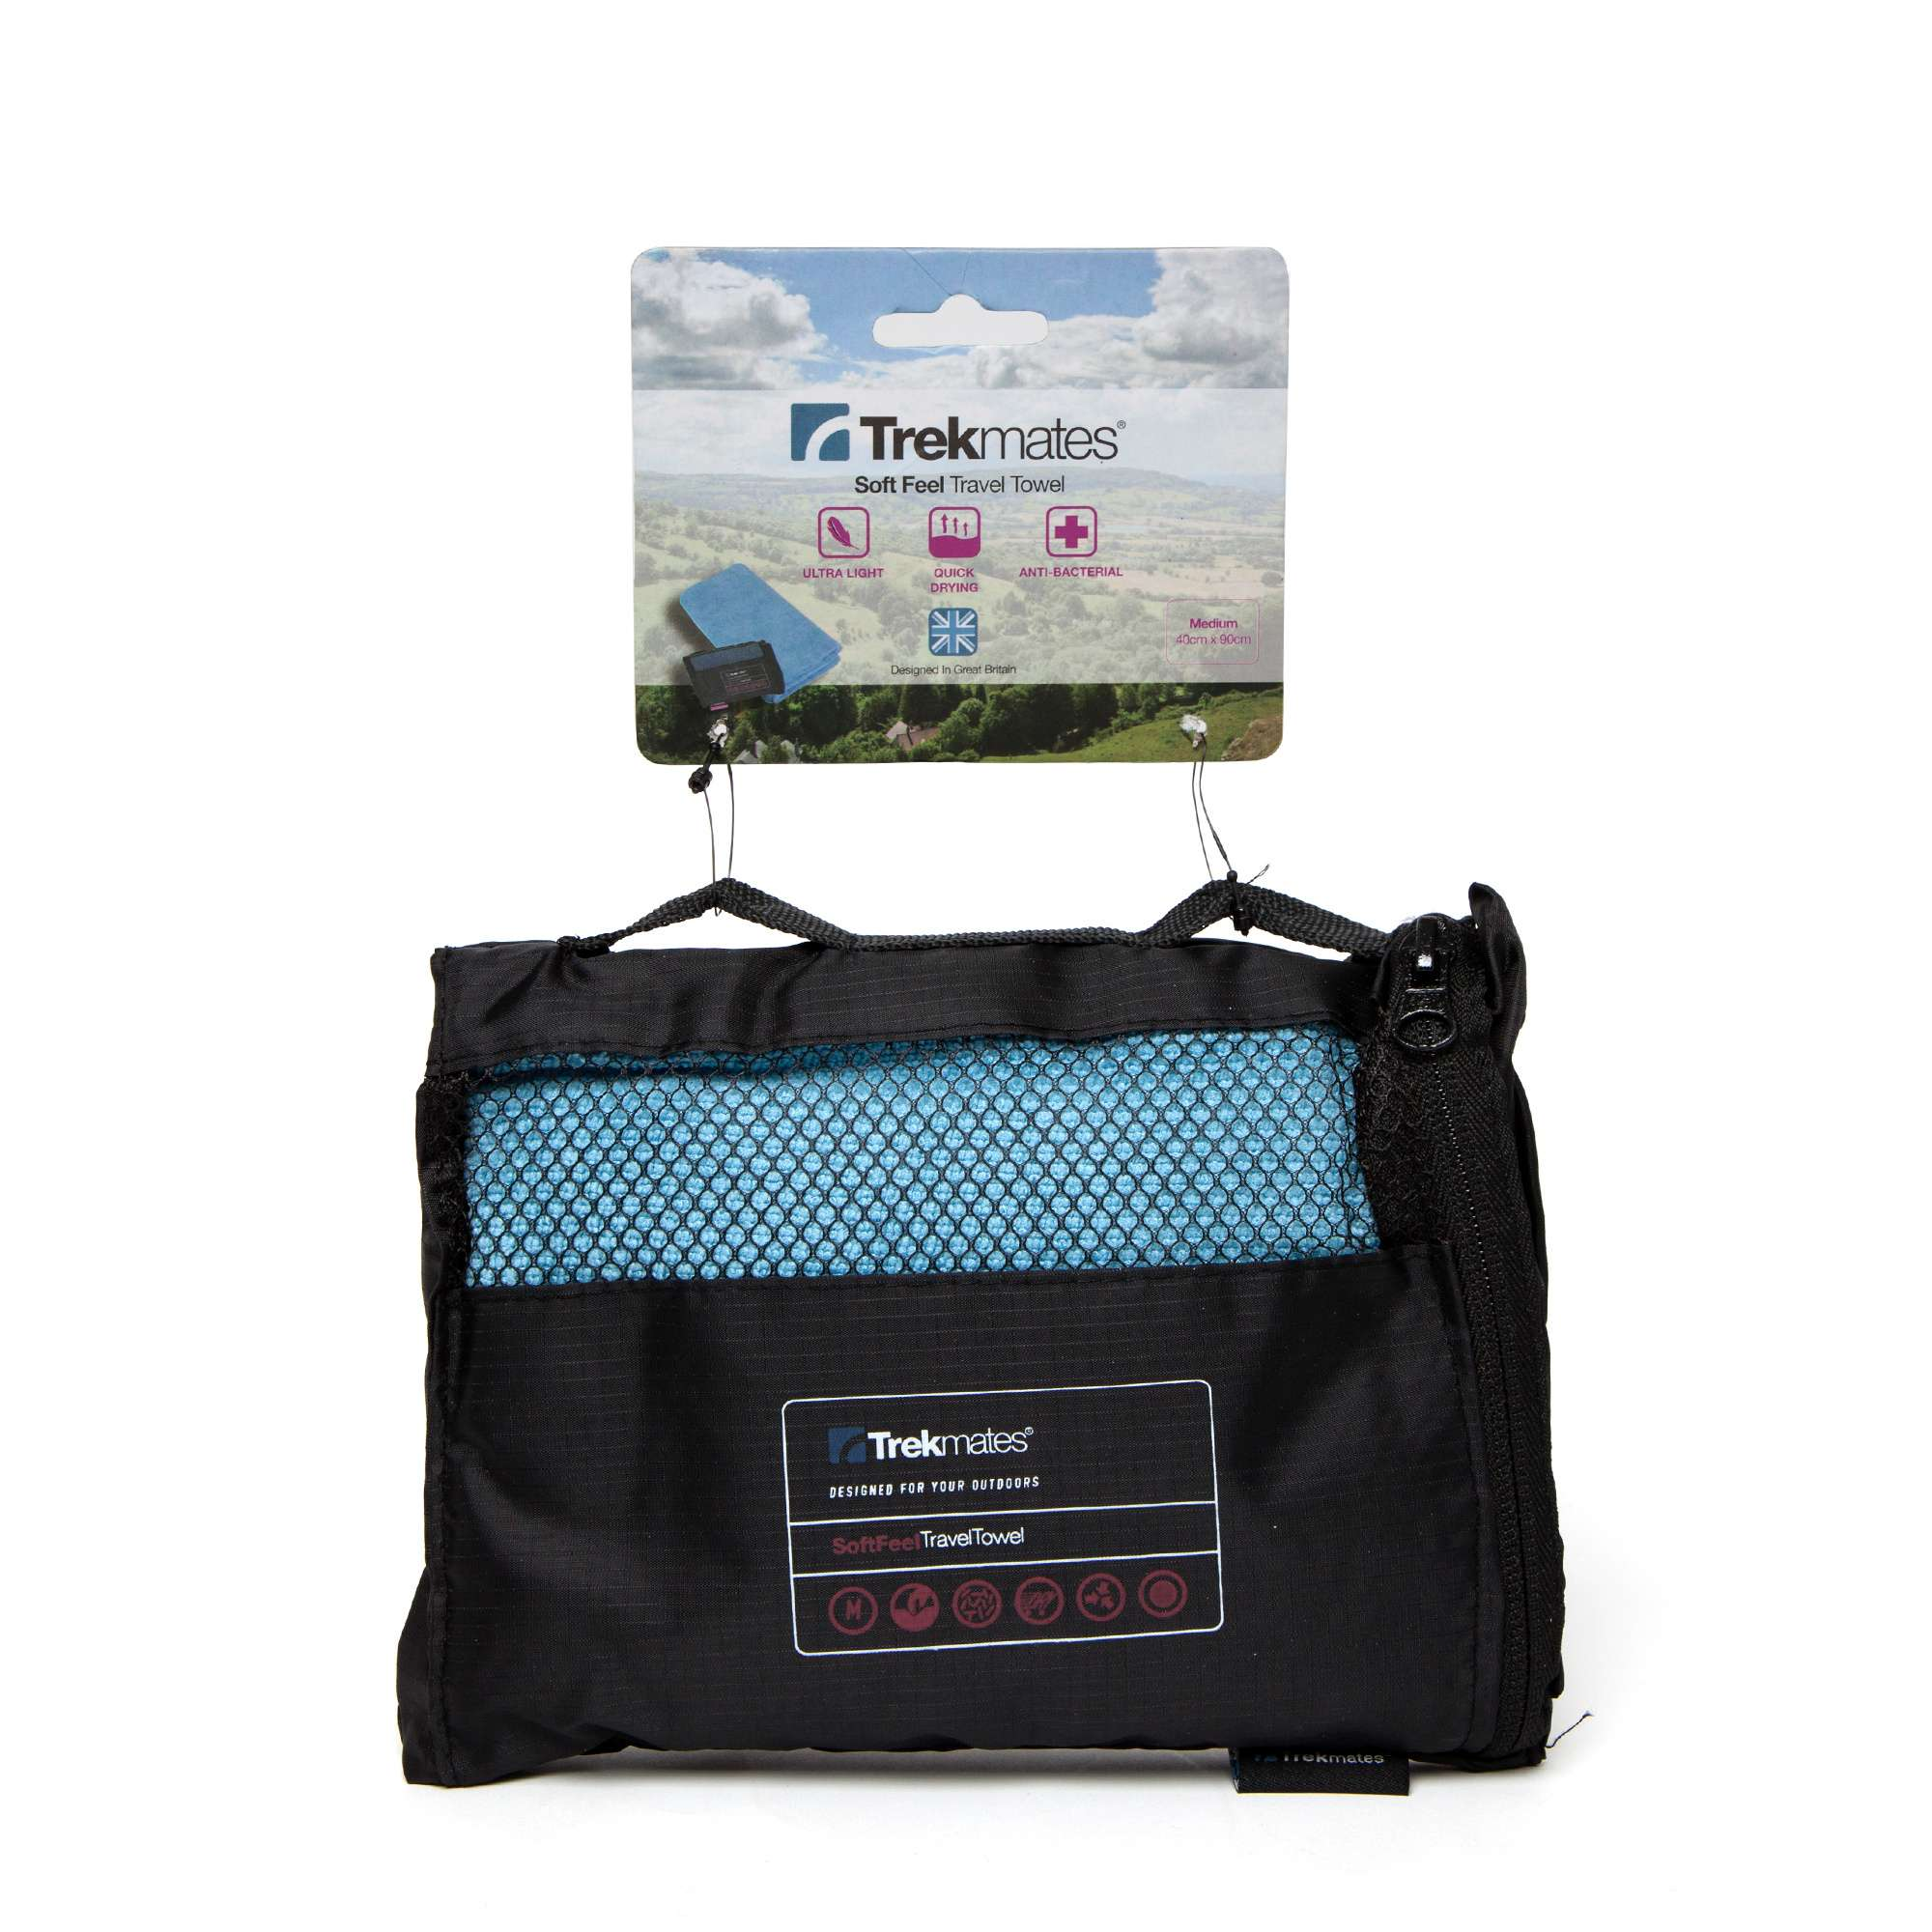 TREKMATES Soft Feel Travel Towel Medium